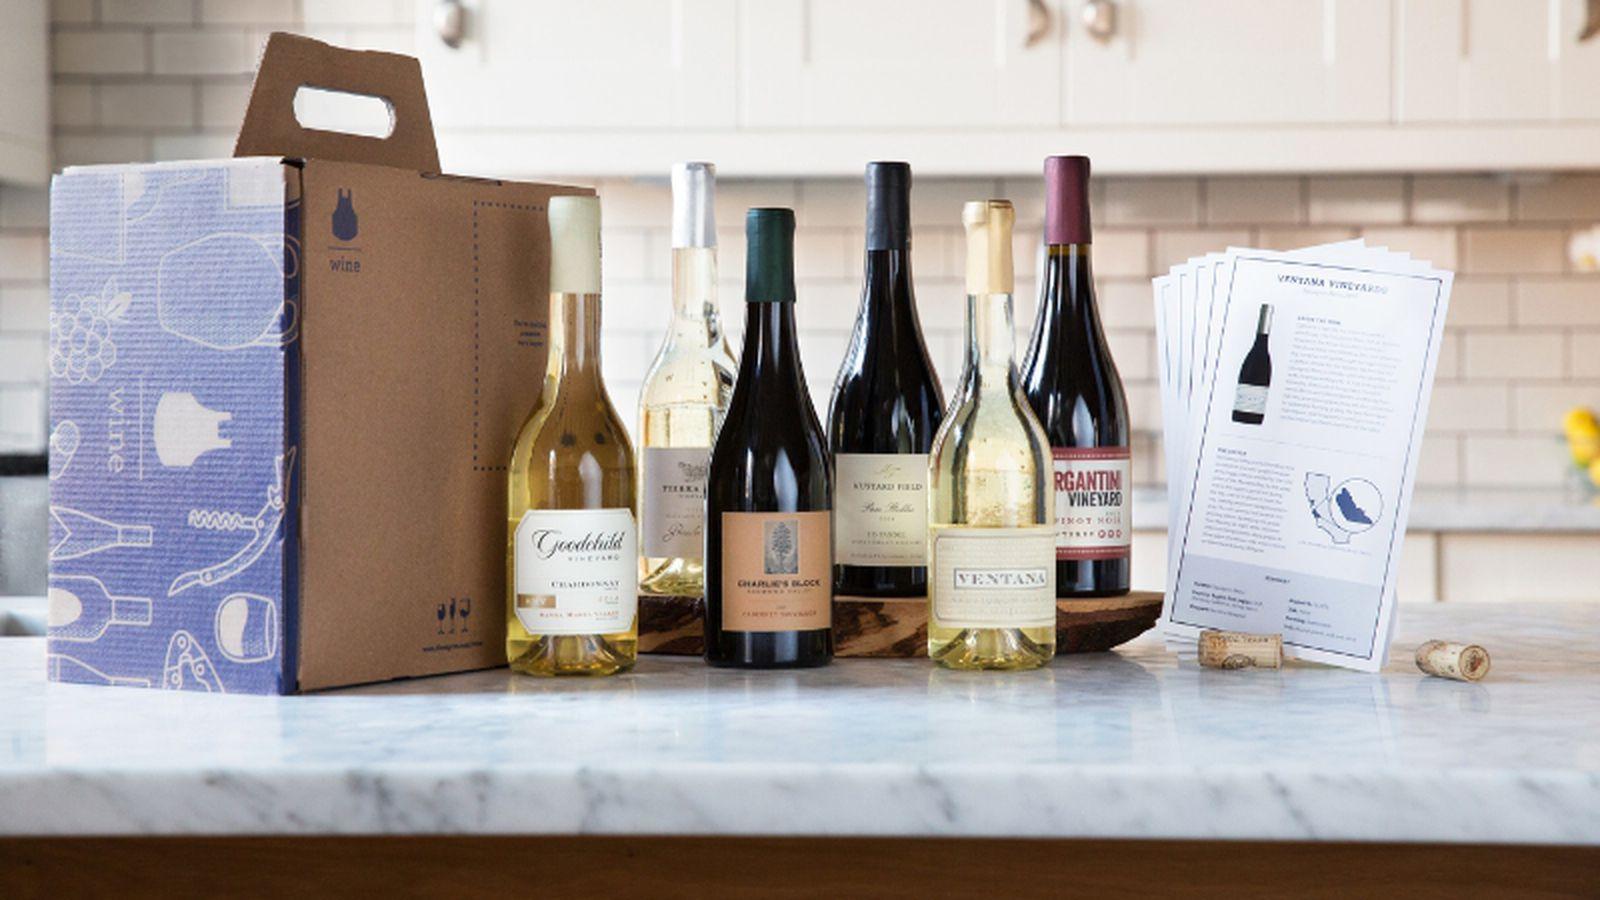 Blue apron wine review - Blue Apron Wine Review 34